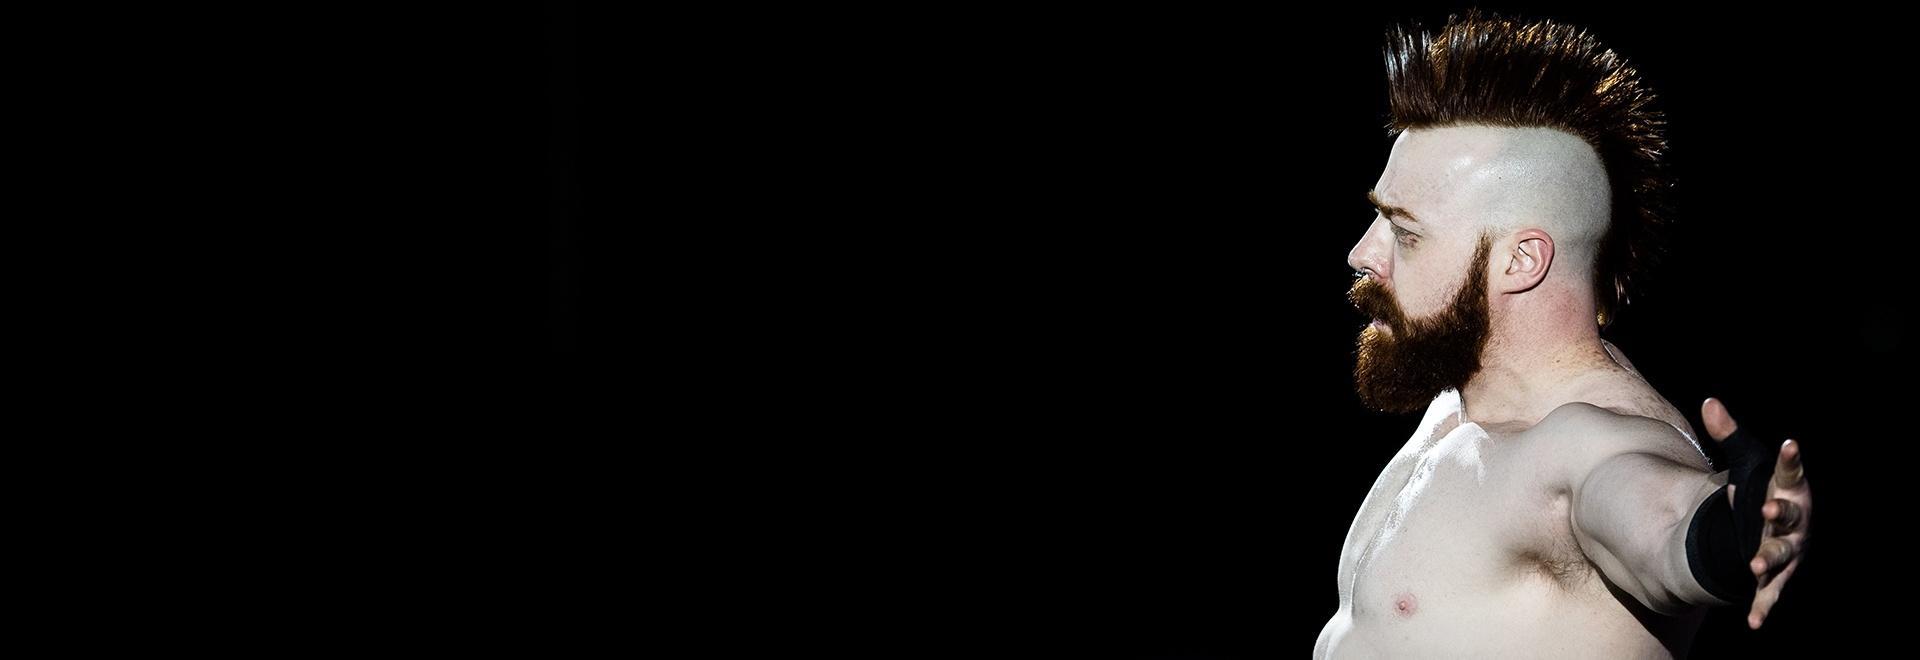 Ep. 54